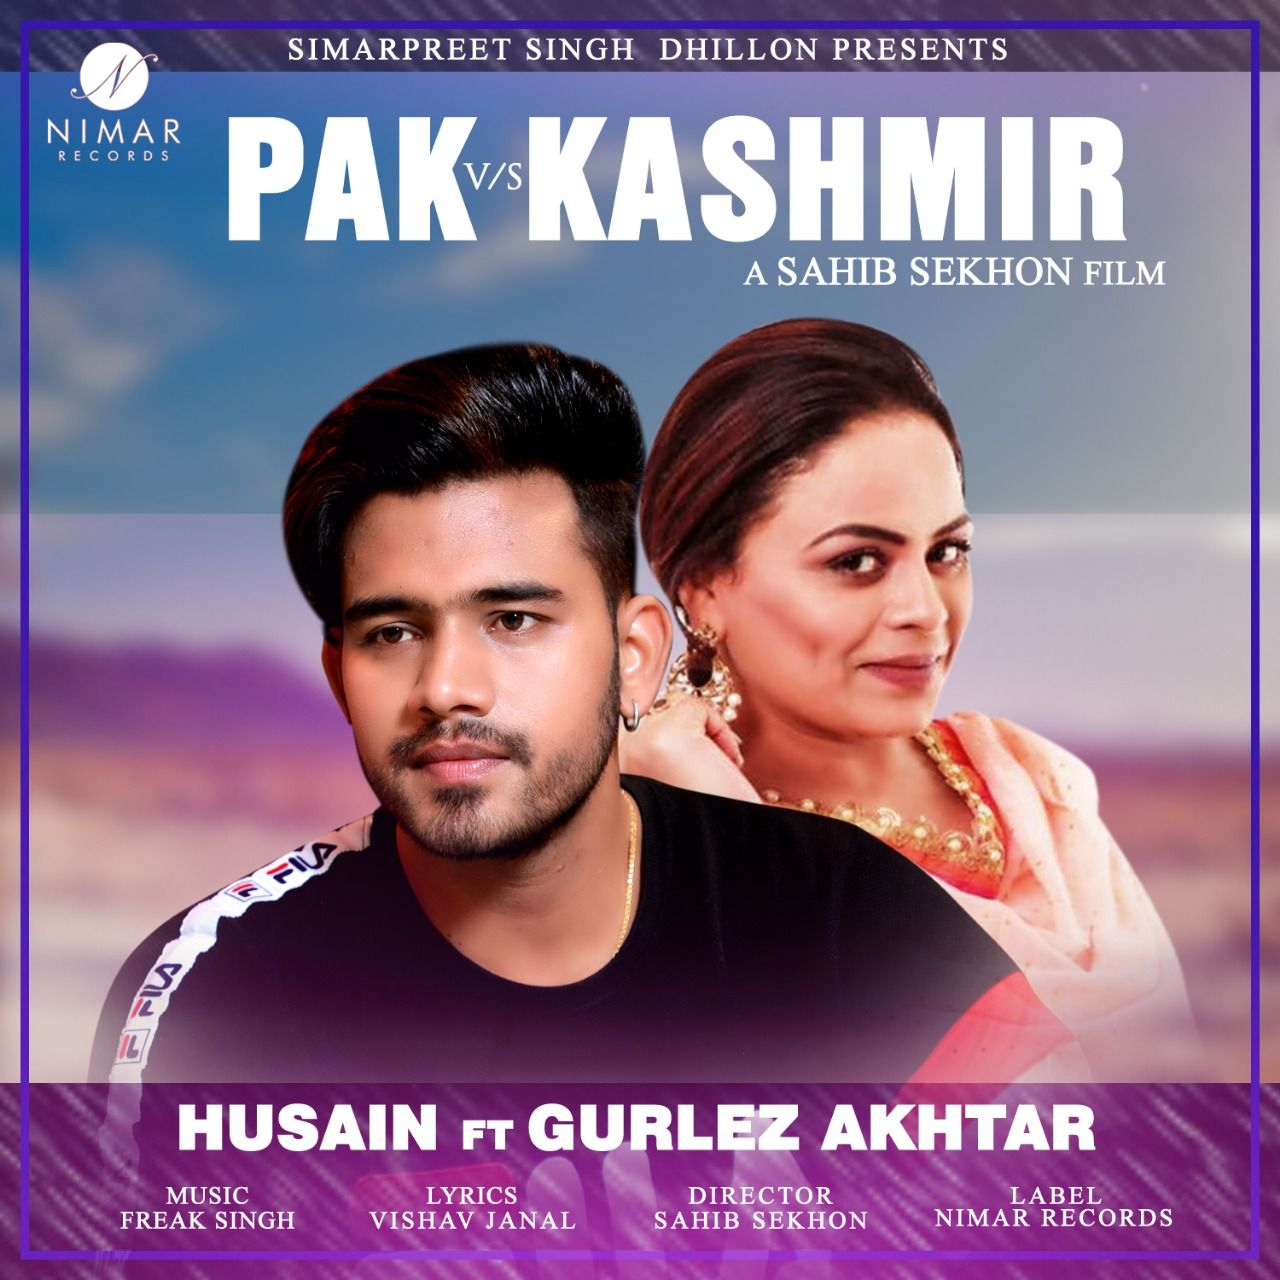 Pak Vs Kashmir By Husain Gurlez Akhtar Mp3 Punjabi Song Download And Listen Songs All Songs Latest Music